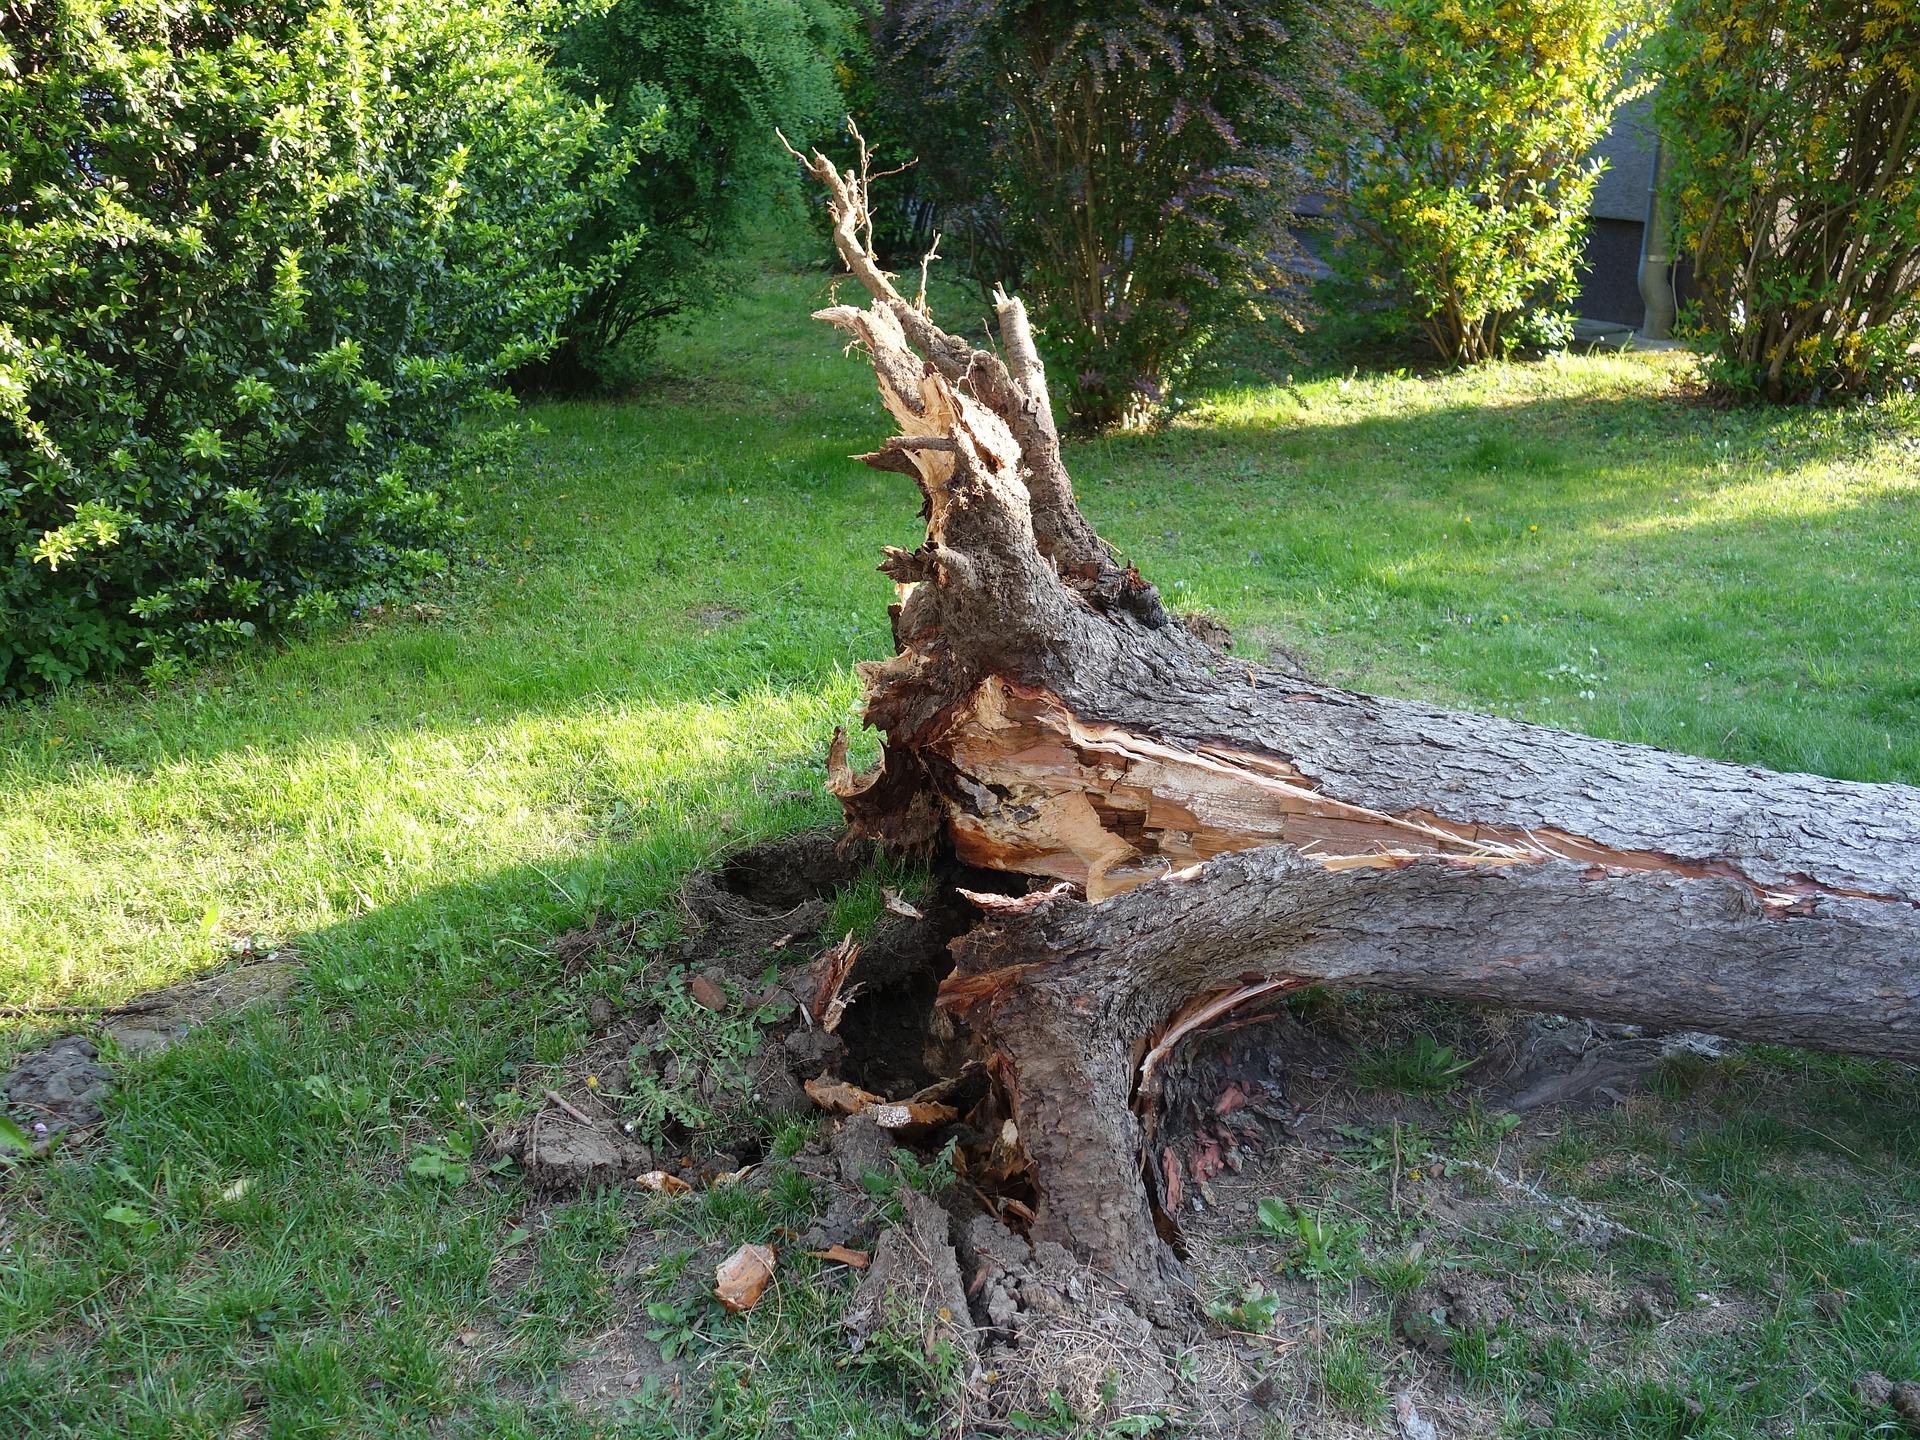 Tree Service - Removal